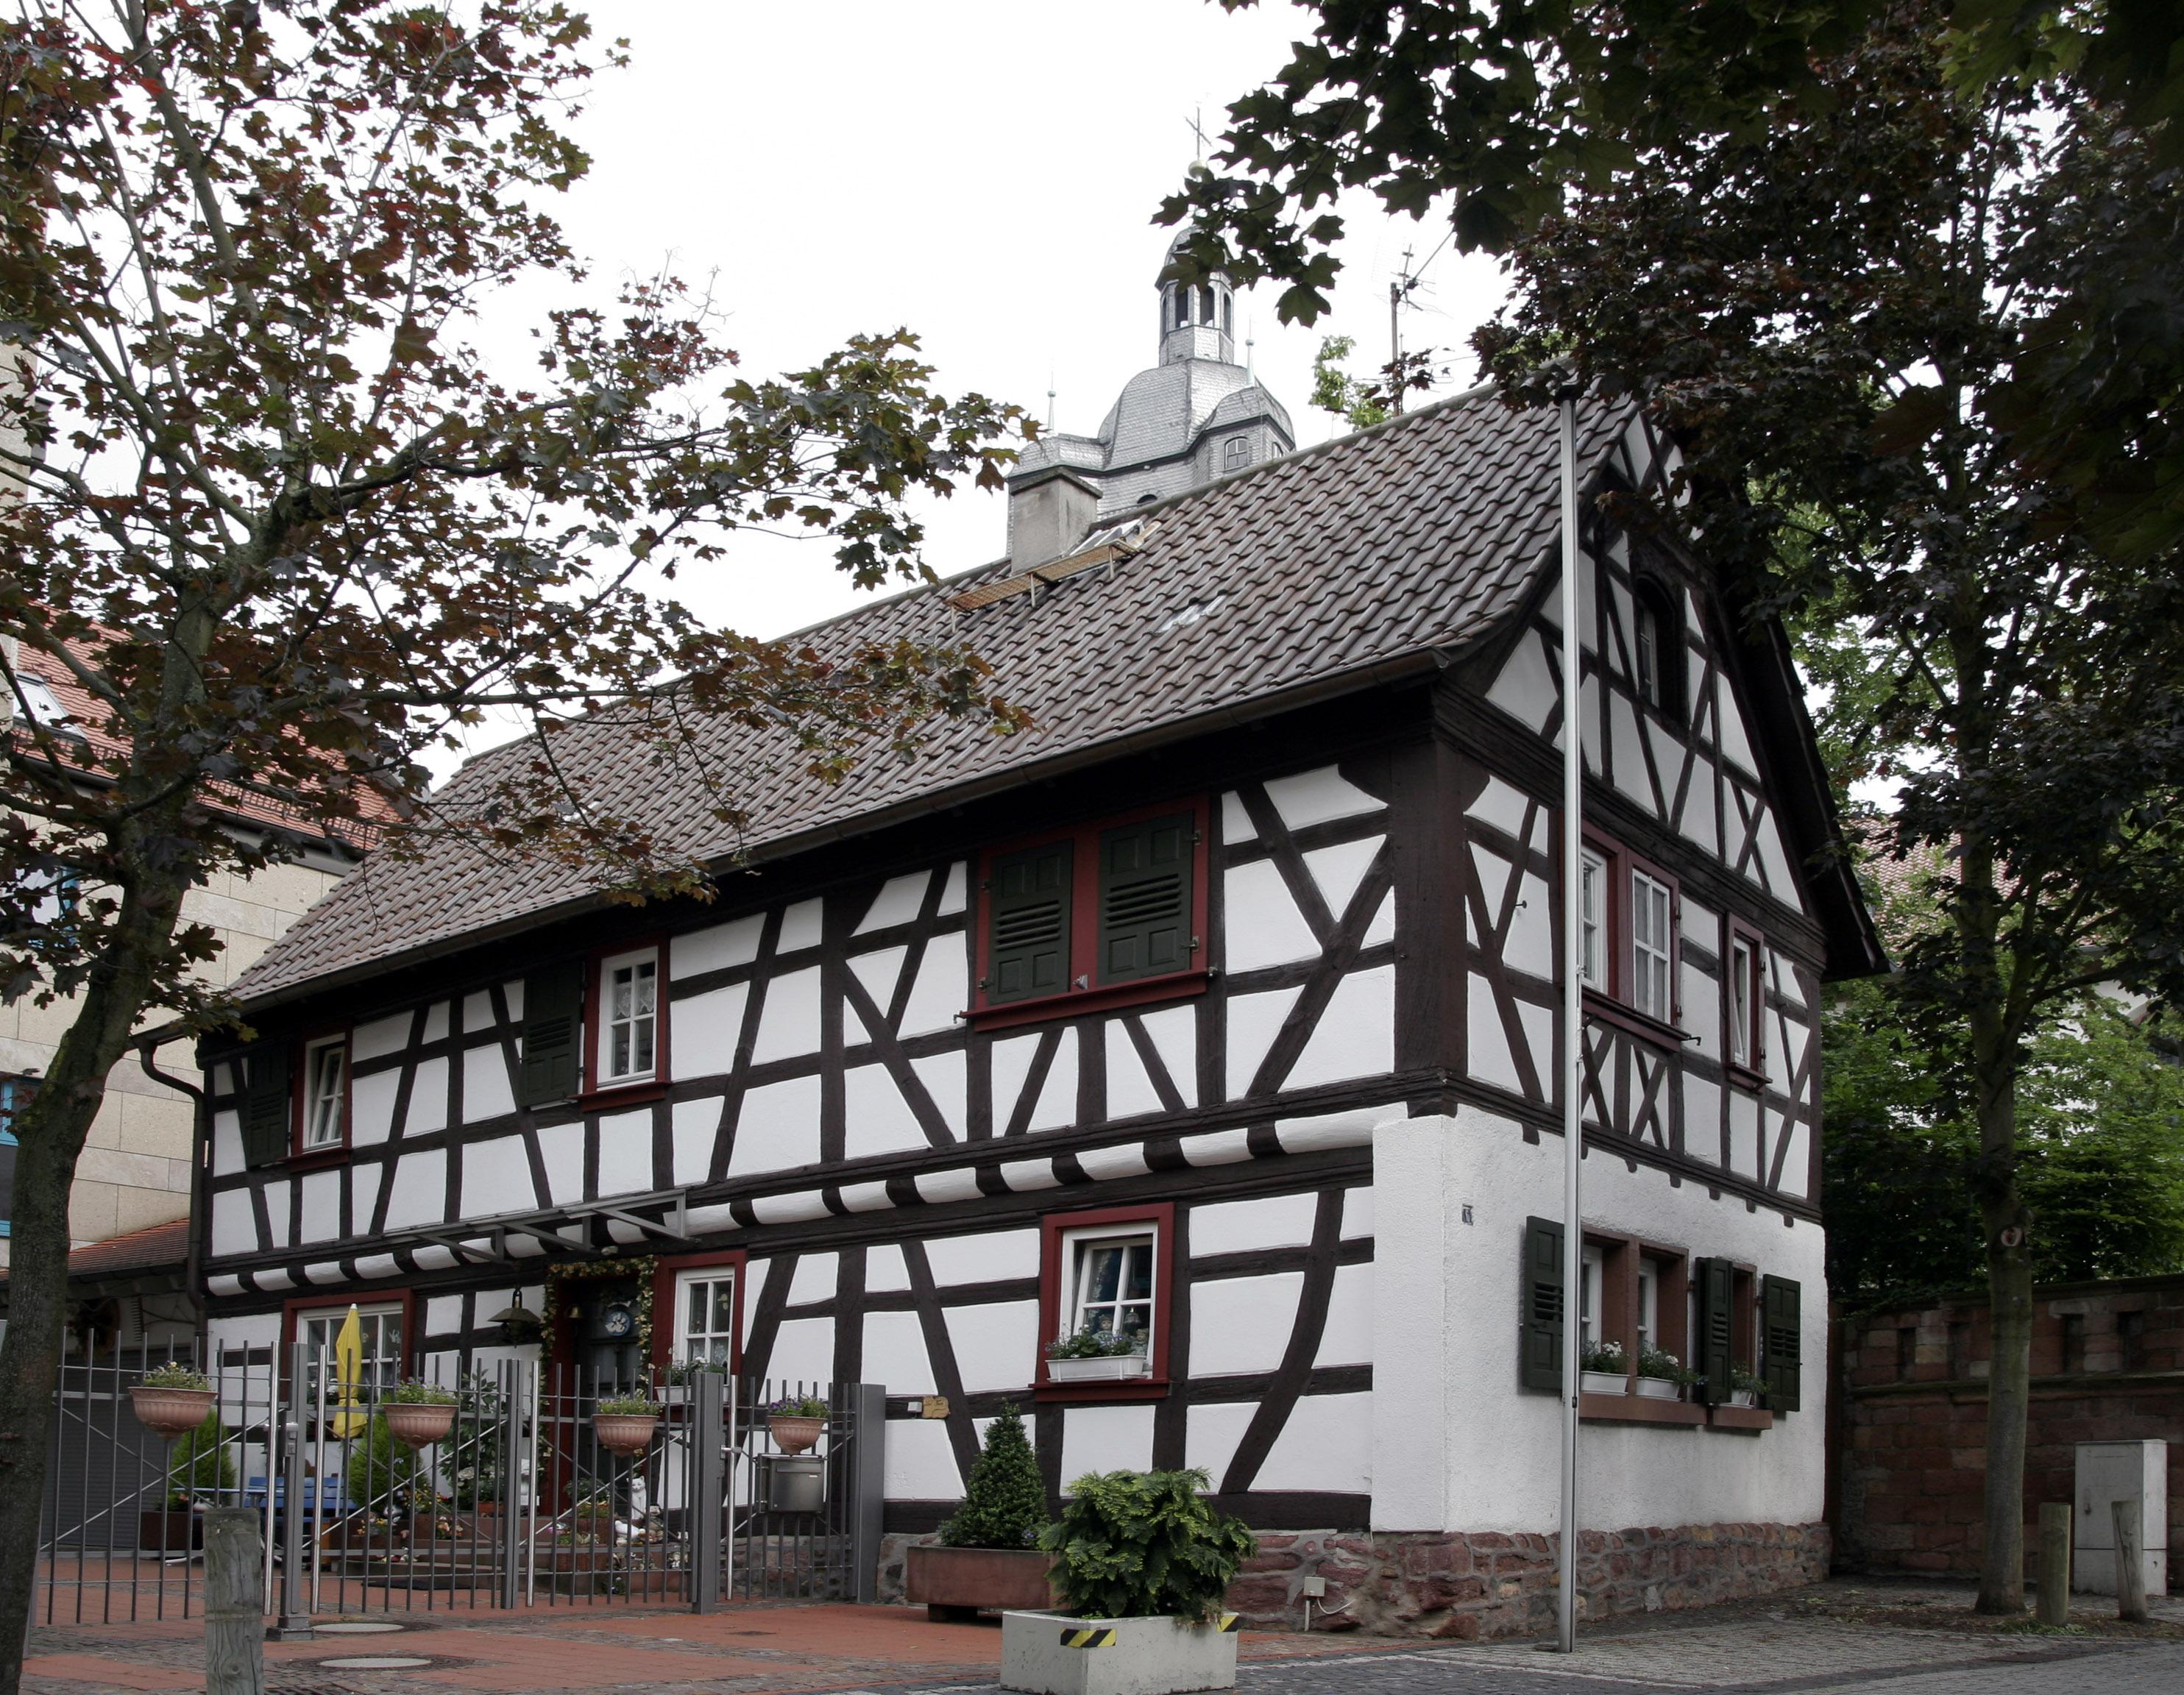 Gross-Gerau Germany  city images : Datei:Gross Gerau Fachwerk 01 – Wikipedia